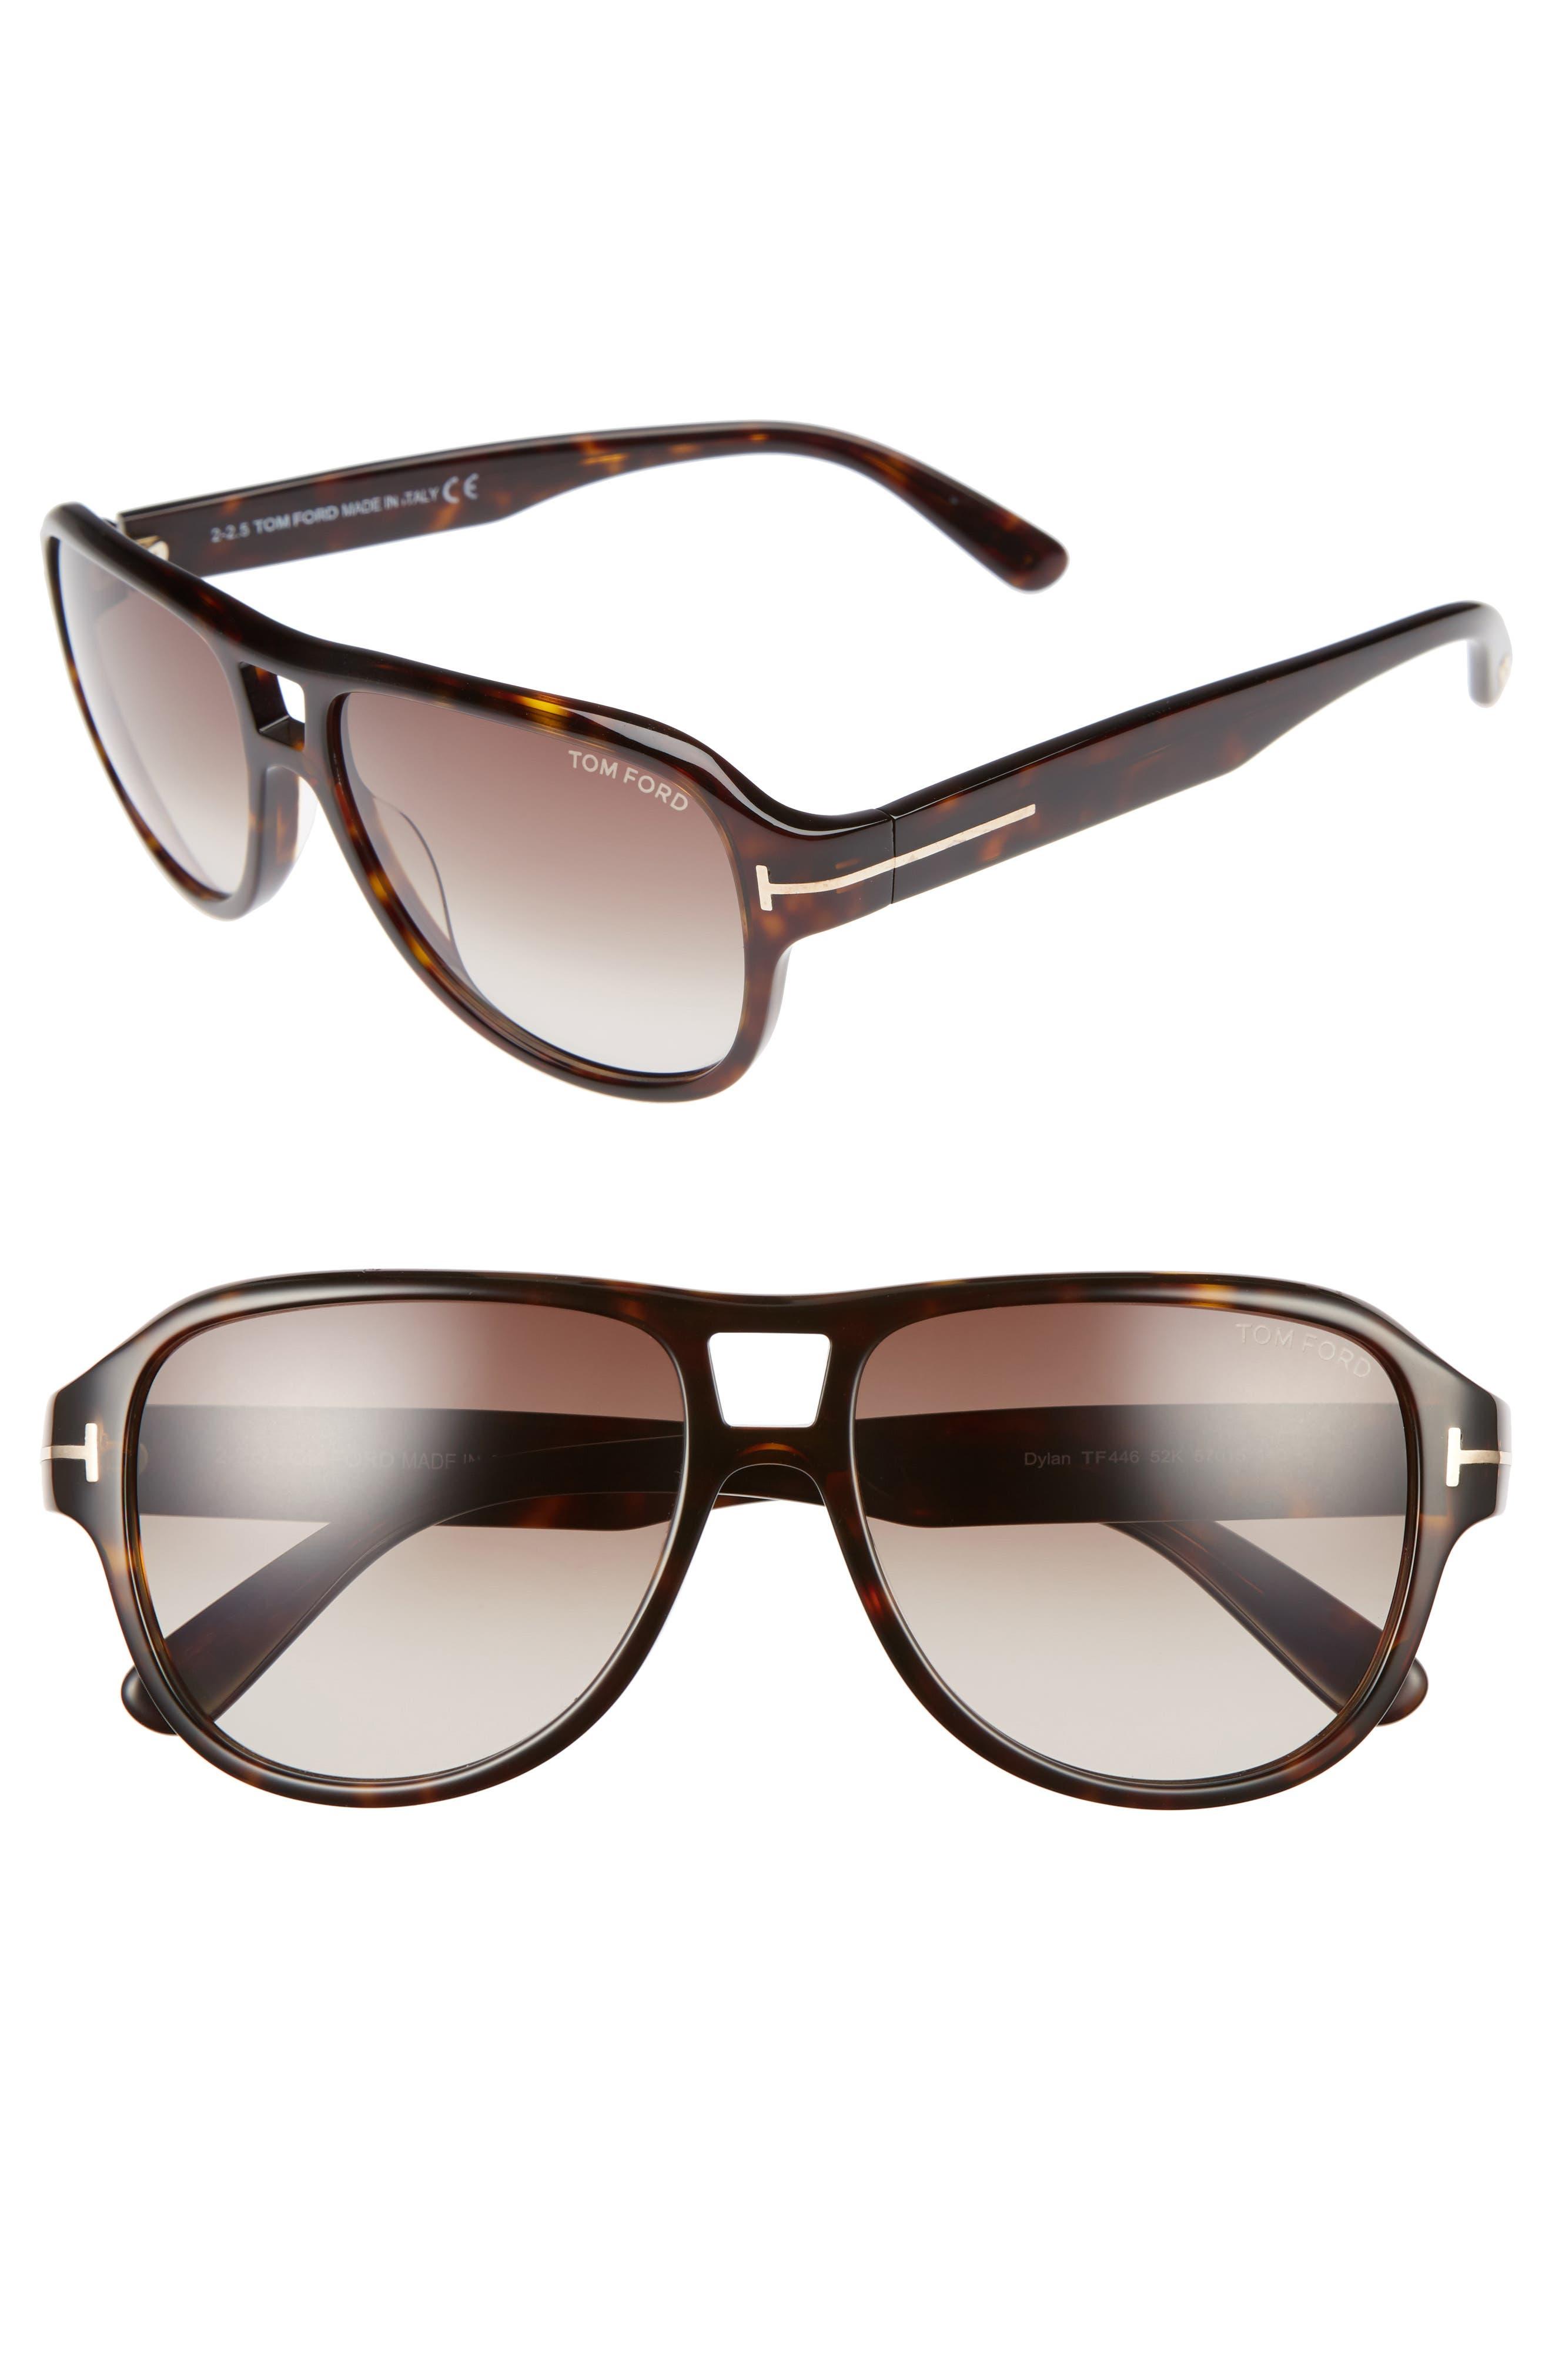 TOM FORD Philippa 55mm Gradient Round Aviator Sunglasses